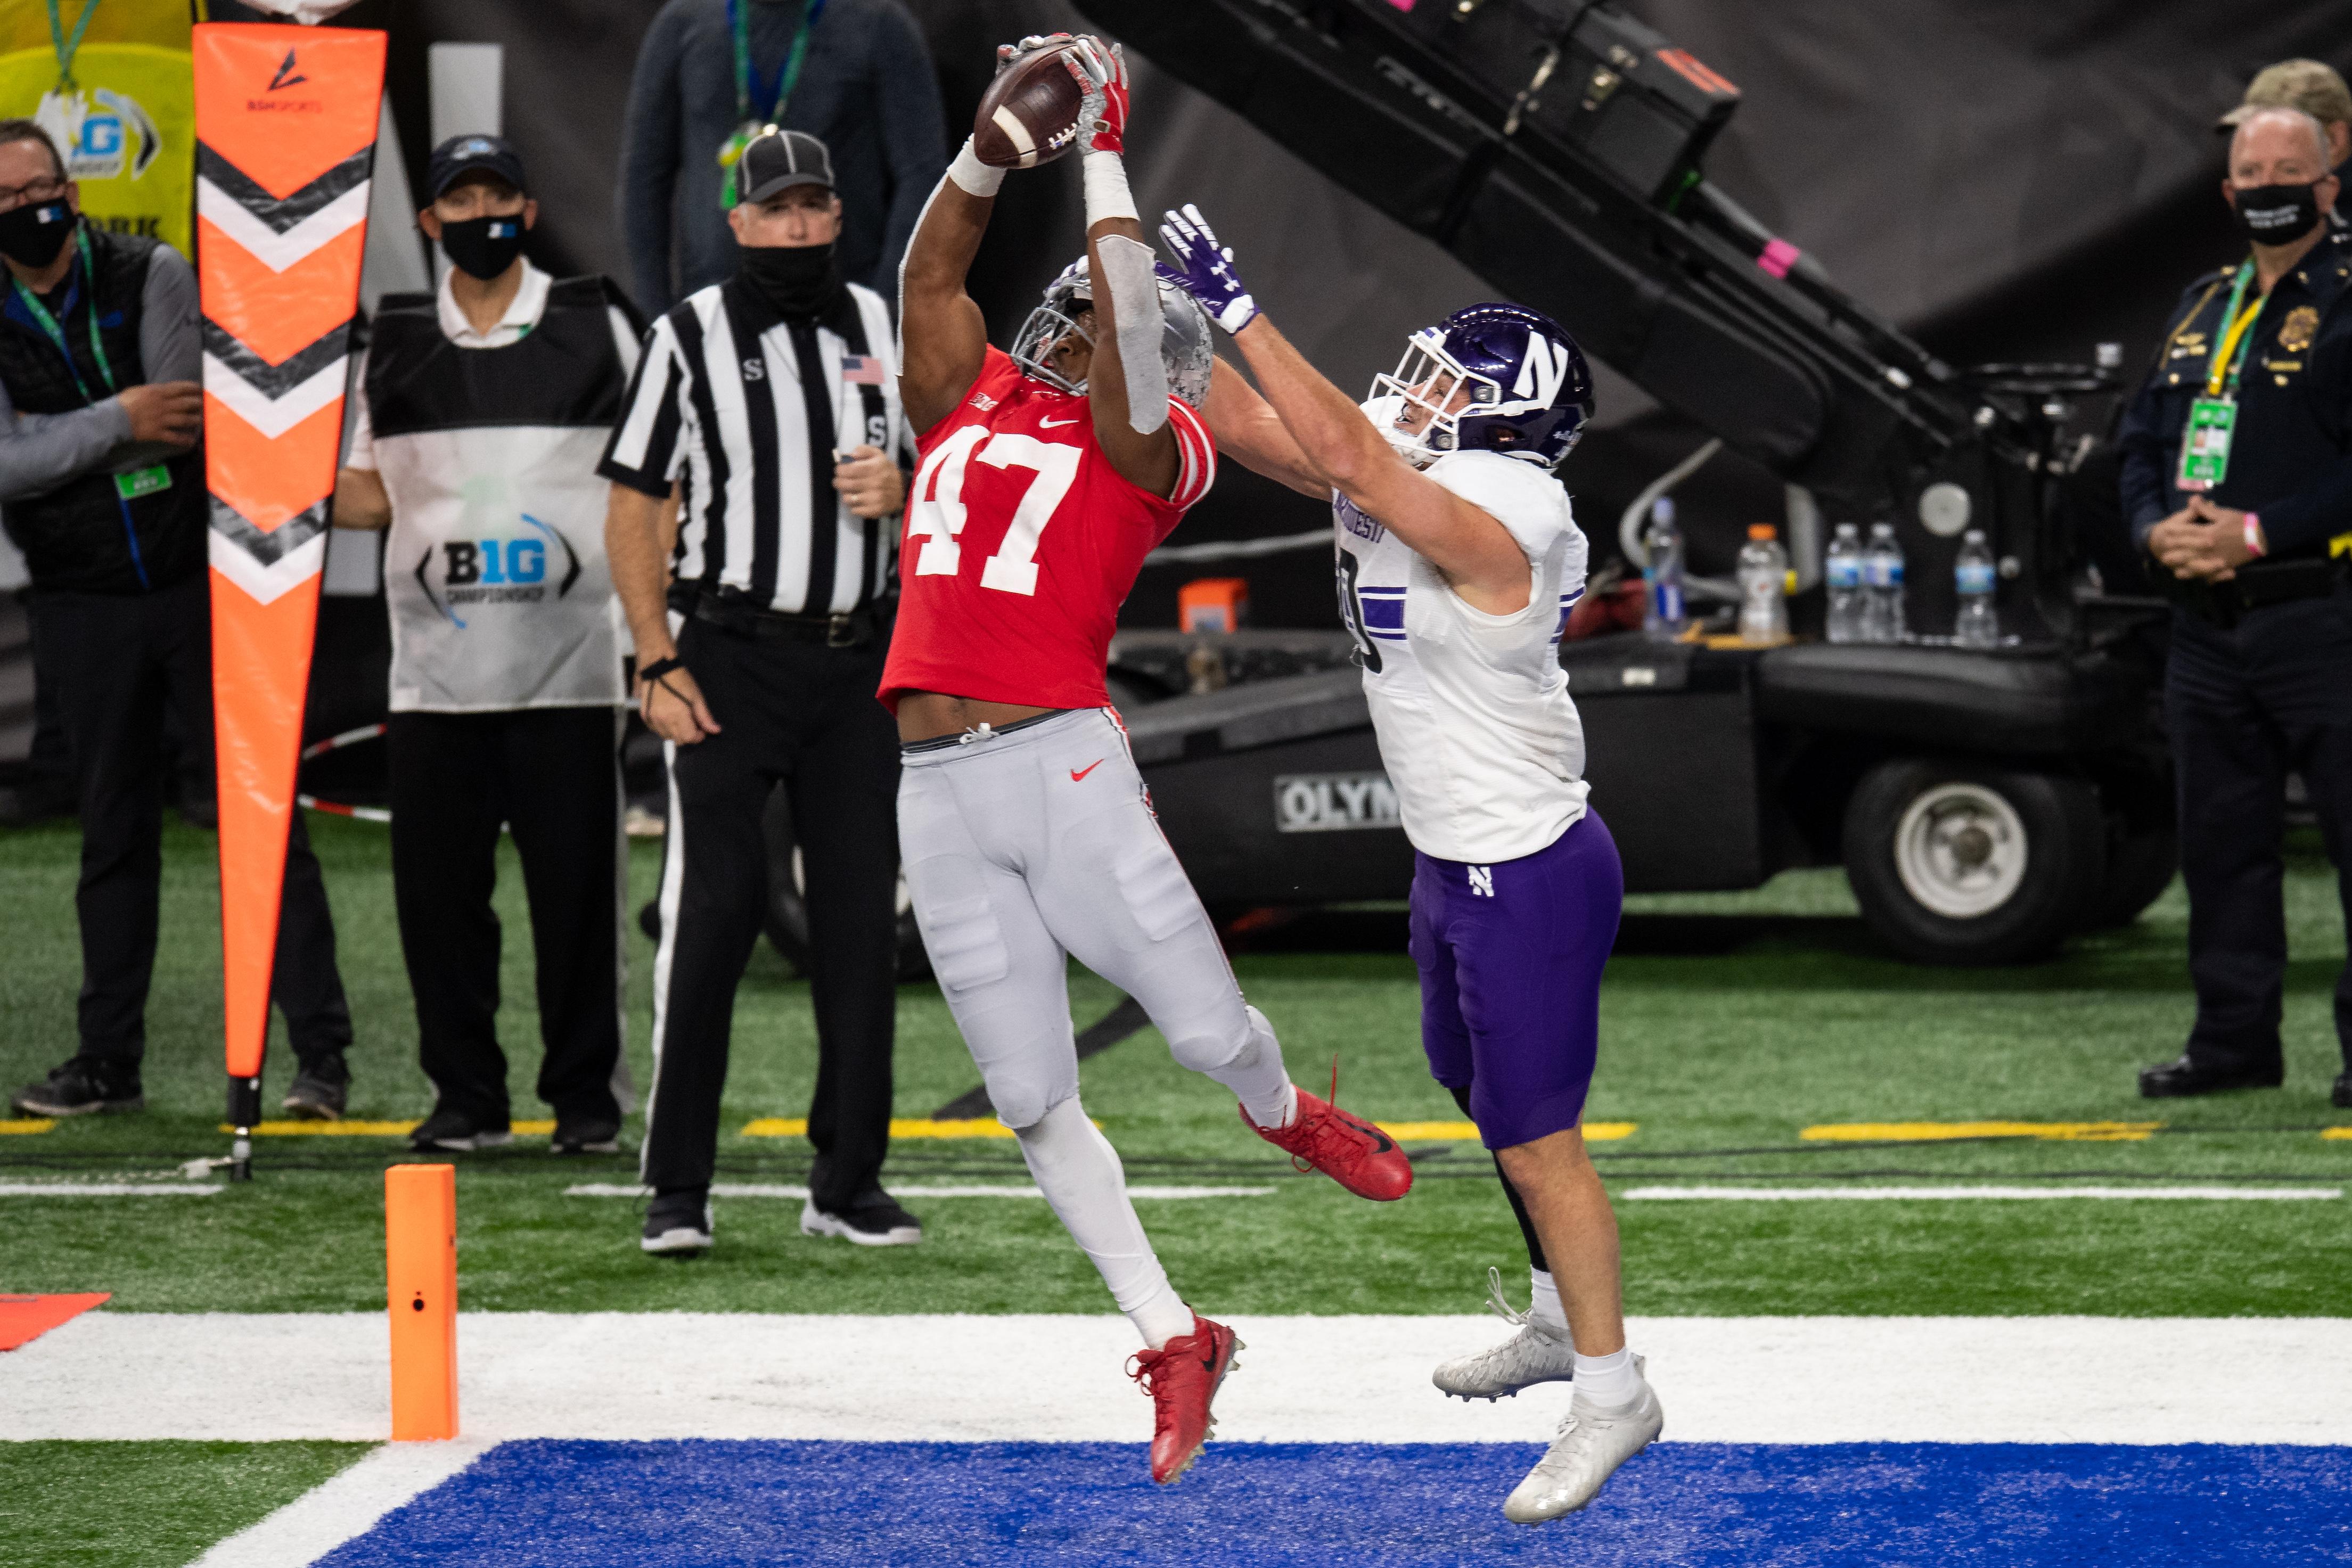 COLLEGE FOOTBALL: DEC 19 Big Ten Championship Game - Northwestern v Ohio State